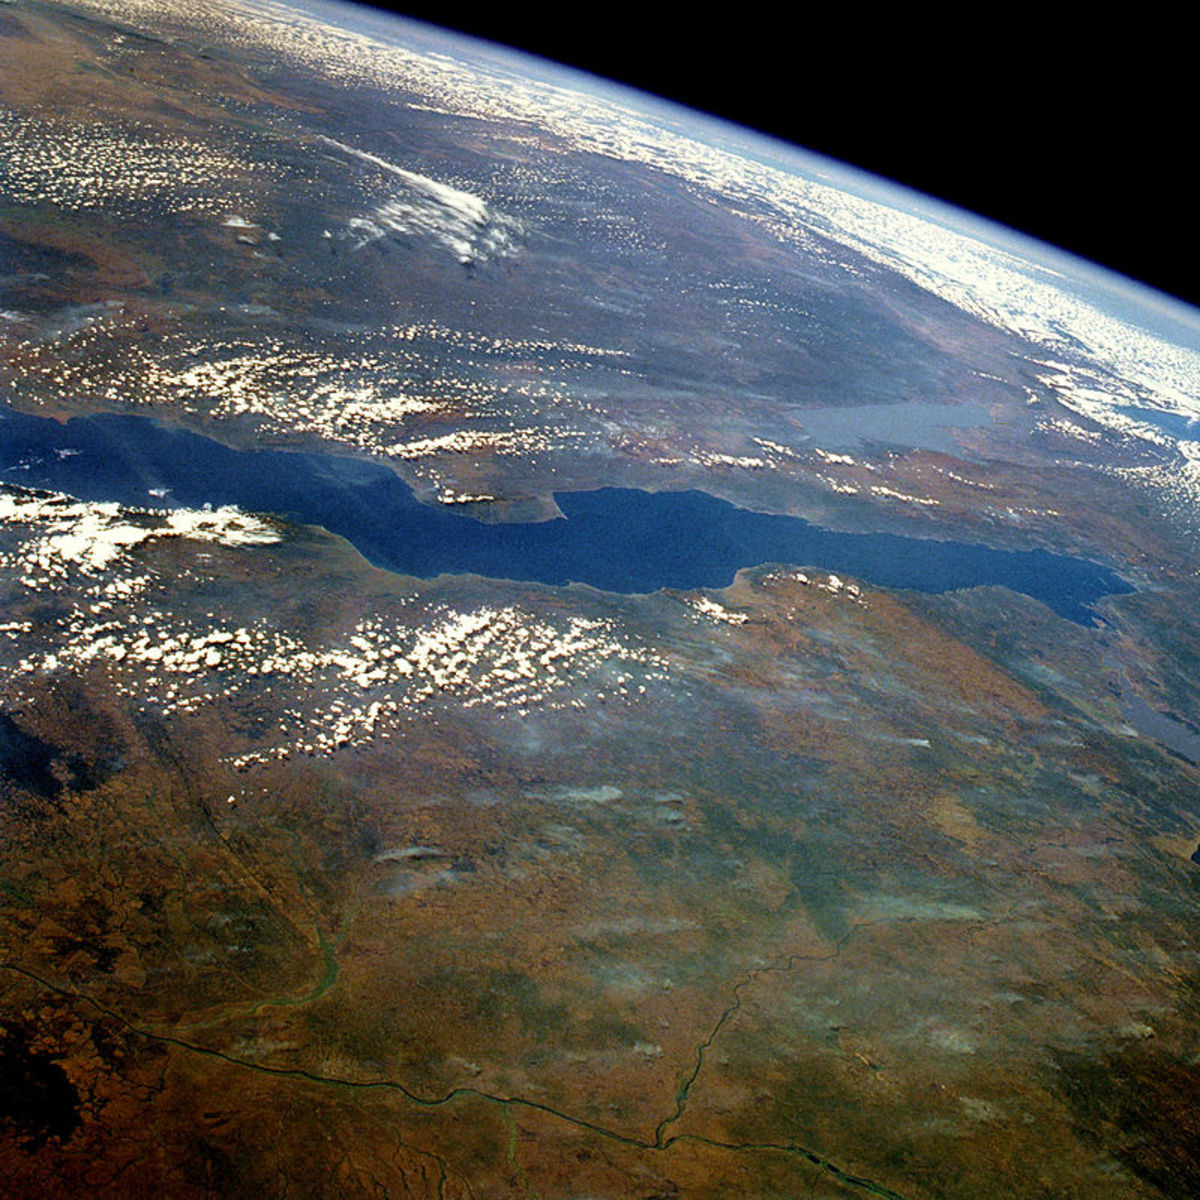 Orbital view of Lake Tanganyika